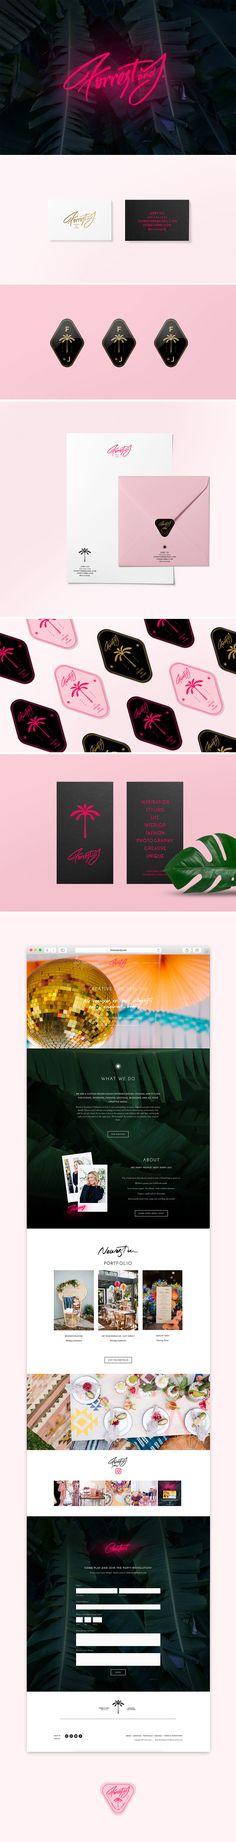 New in Portfolio: Forrest & J. Brand Identity – Cocorrina